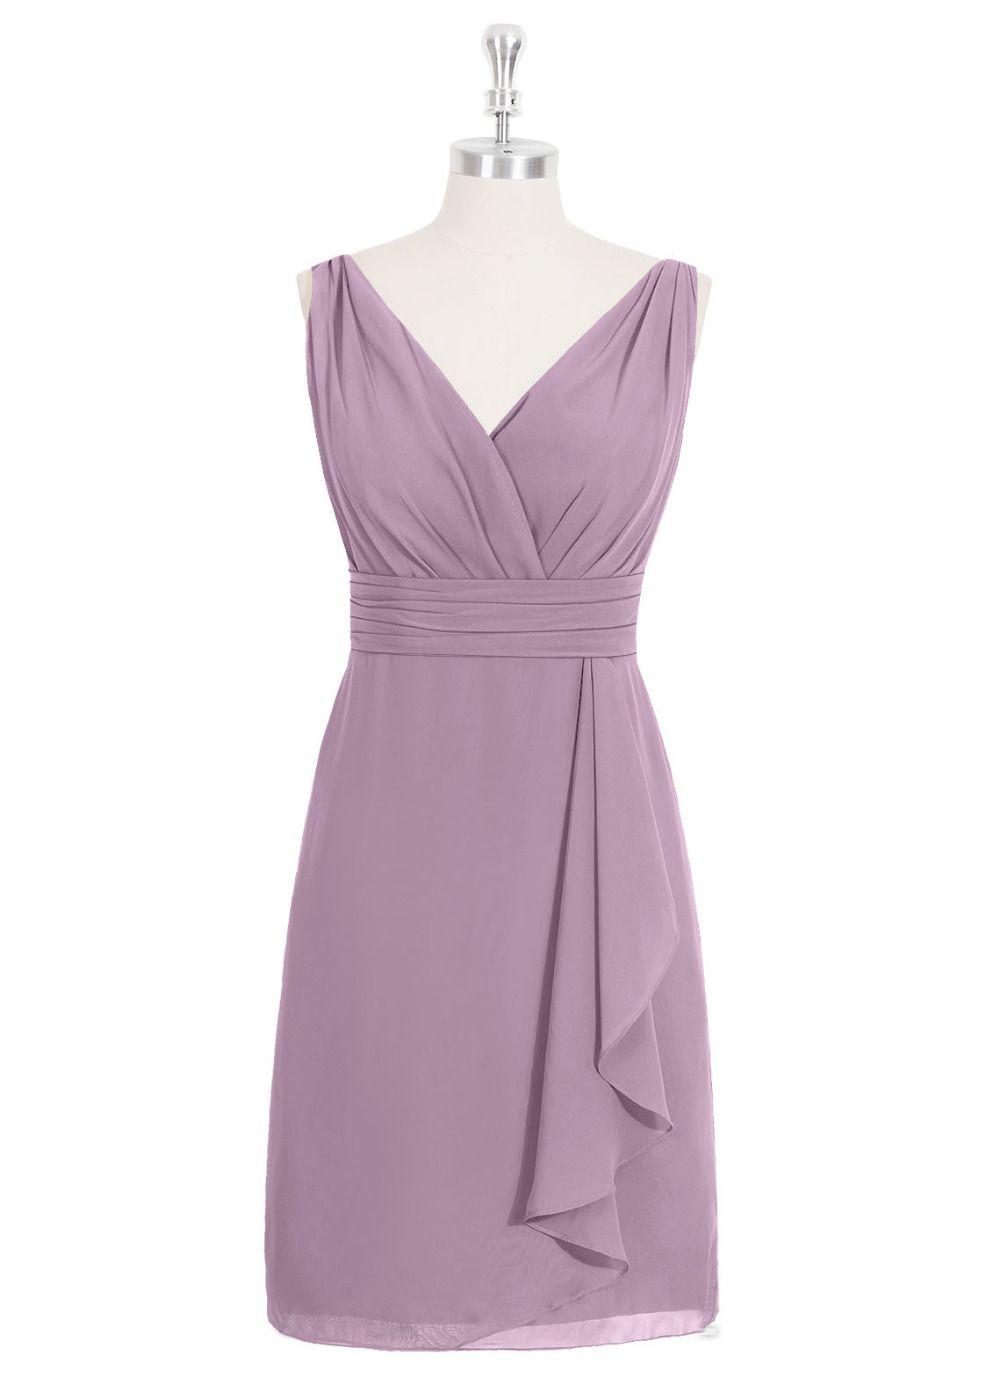 New Arrival Short Bridesmaid Dress Knee Length Sleeveless Chiffon Summer Custom Made V Neck